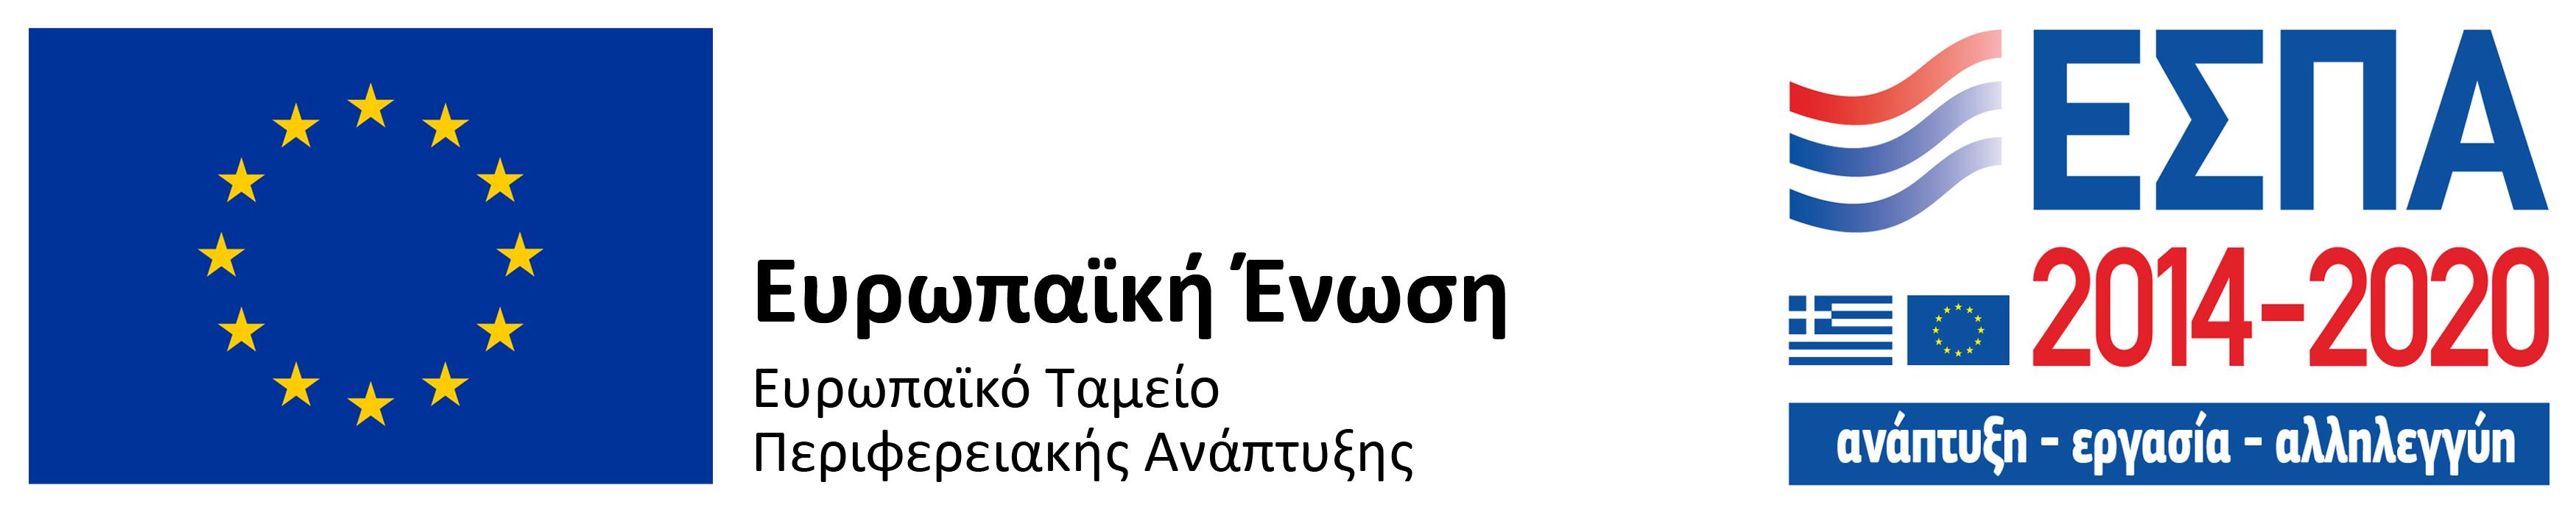 espa_greek